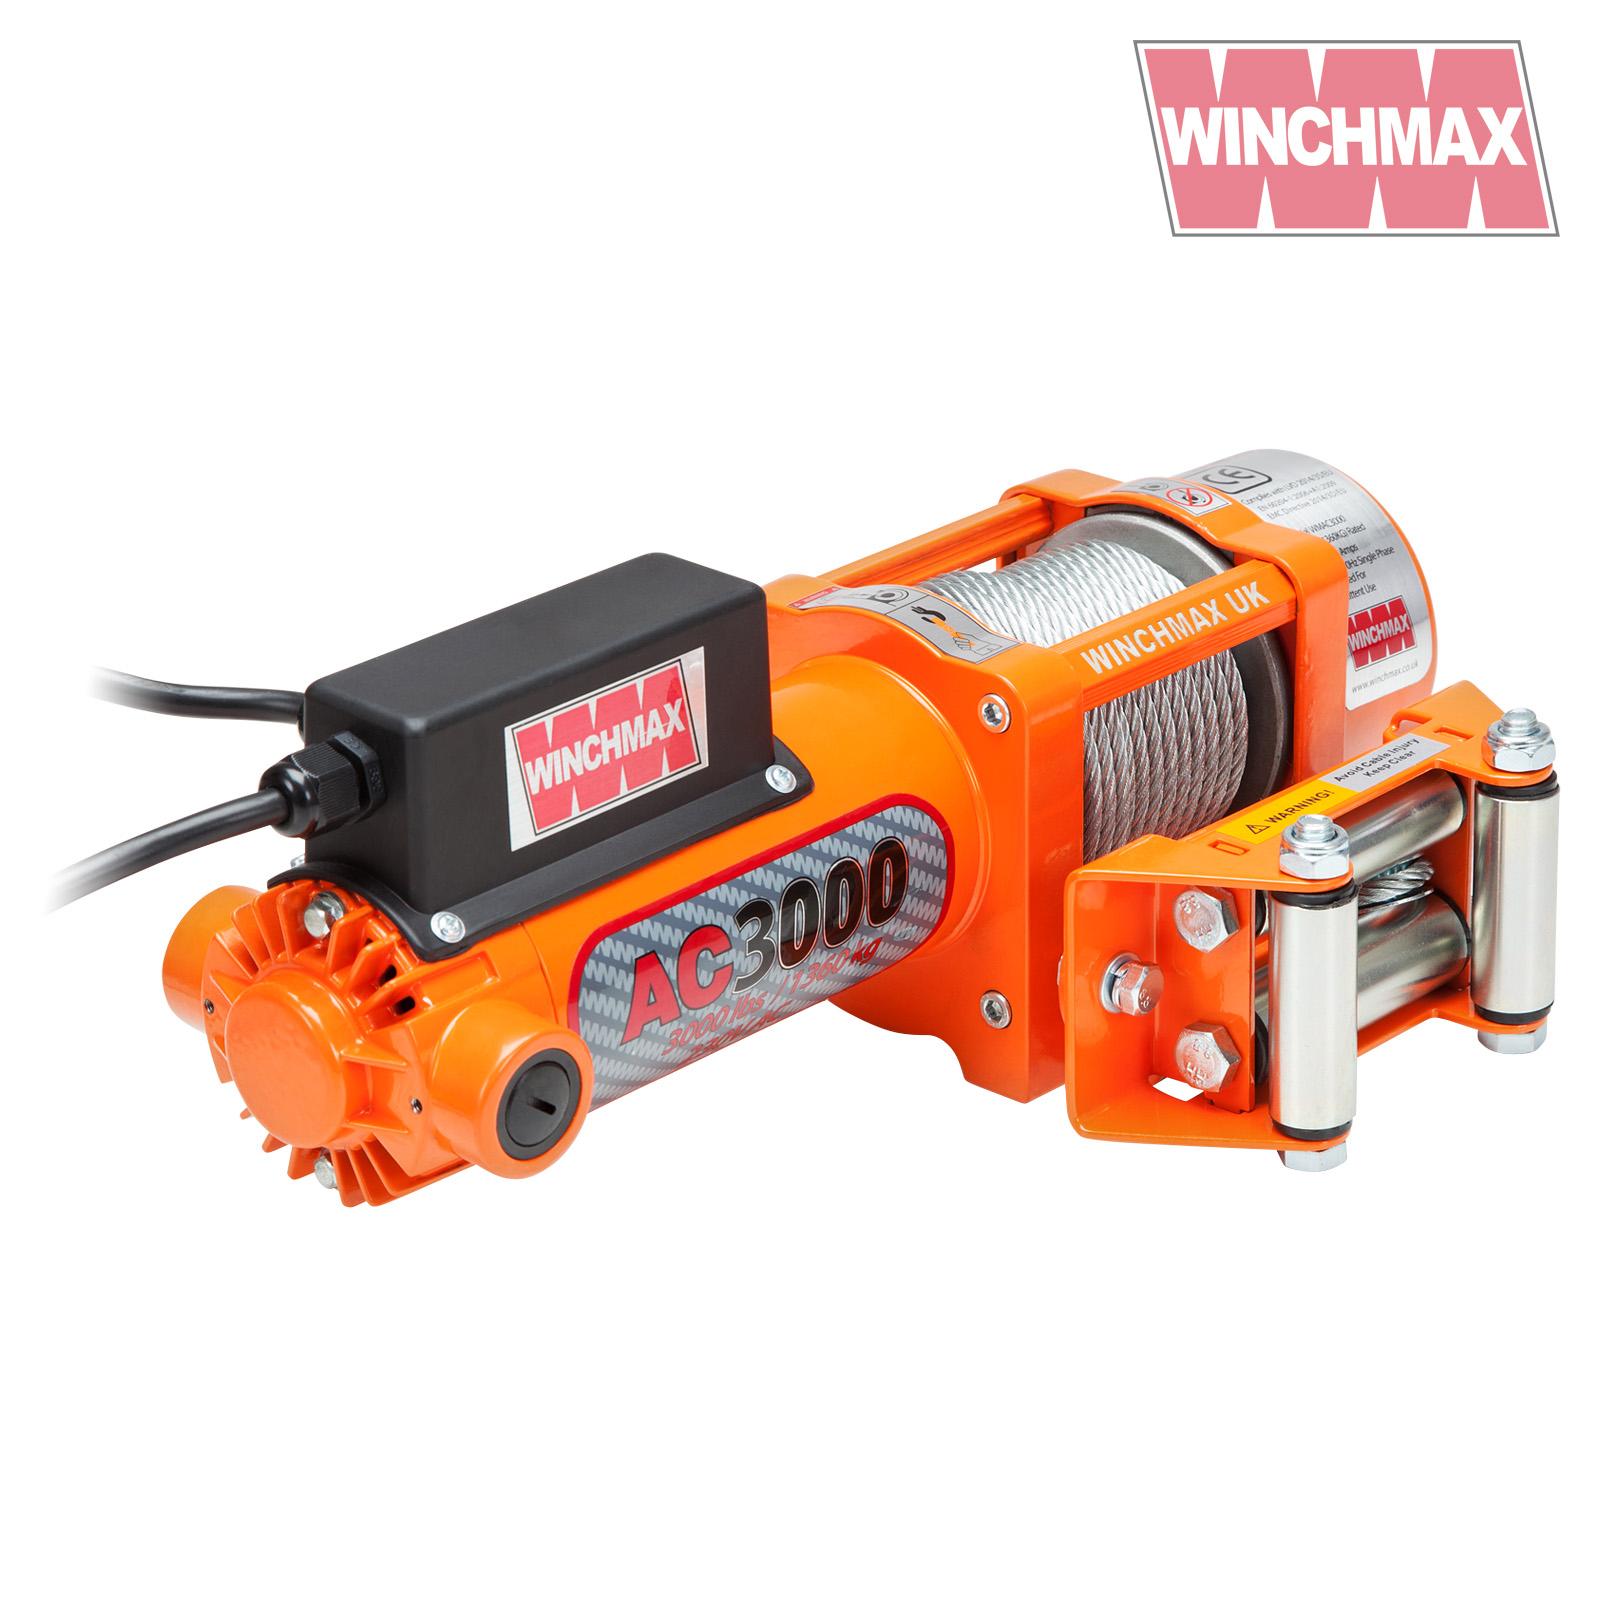 Wmac3000 winchmax 246